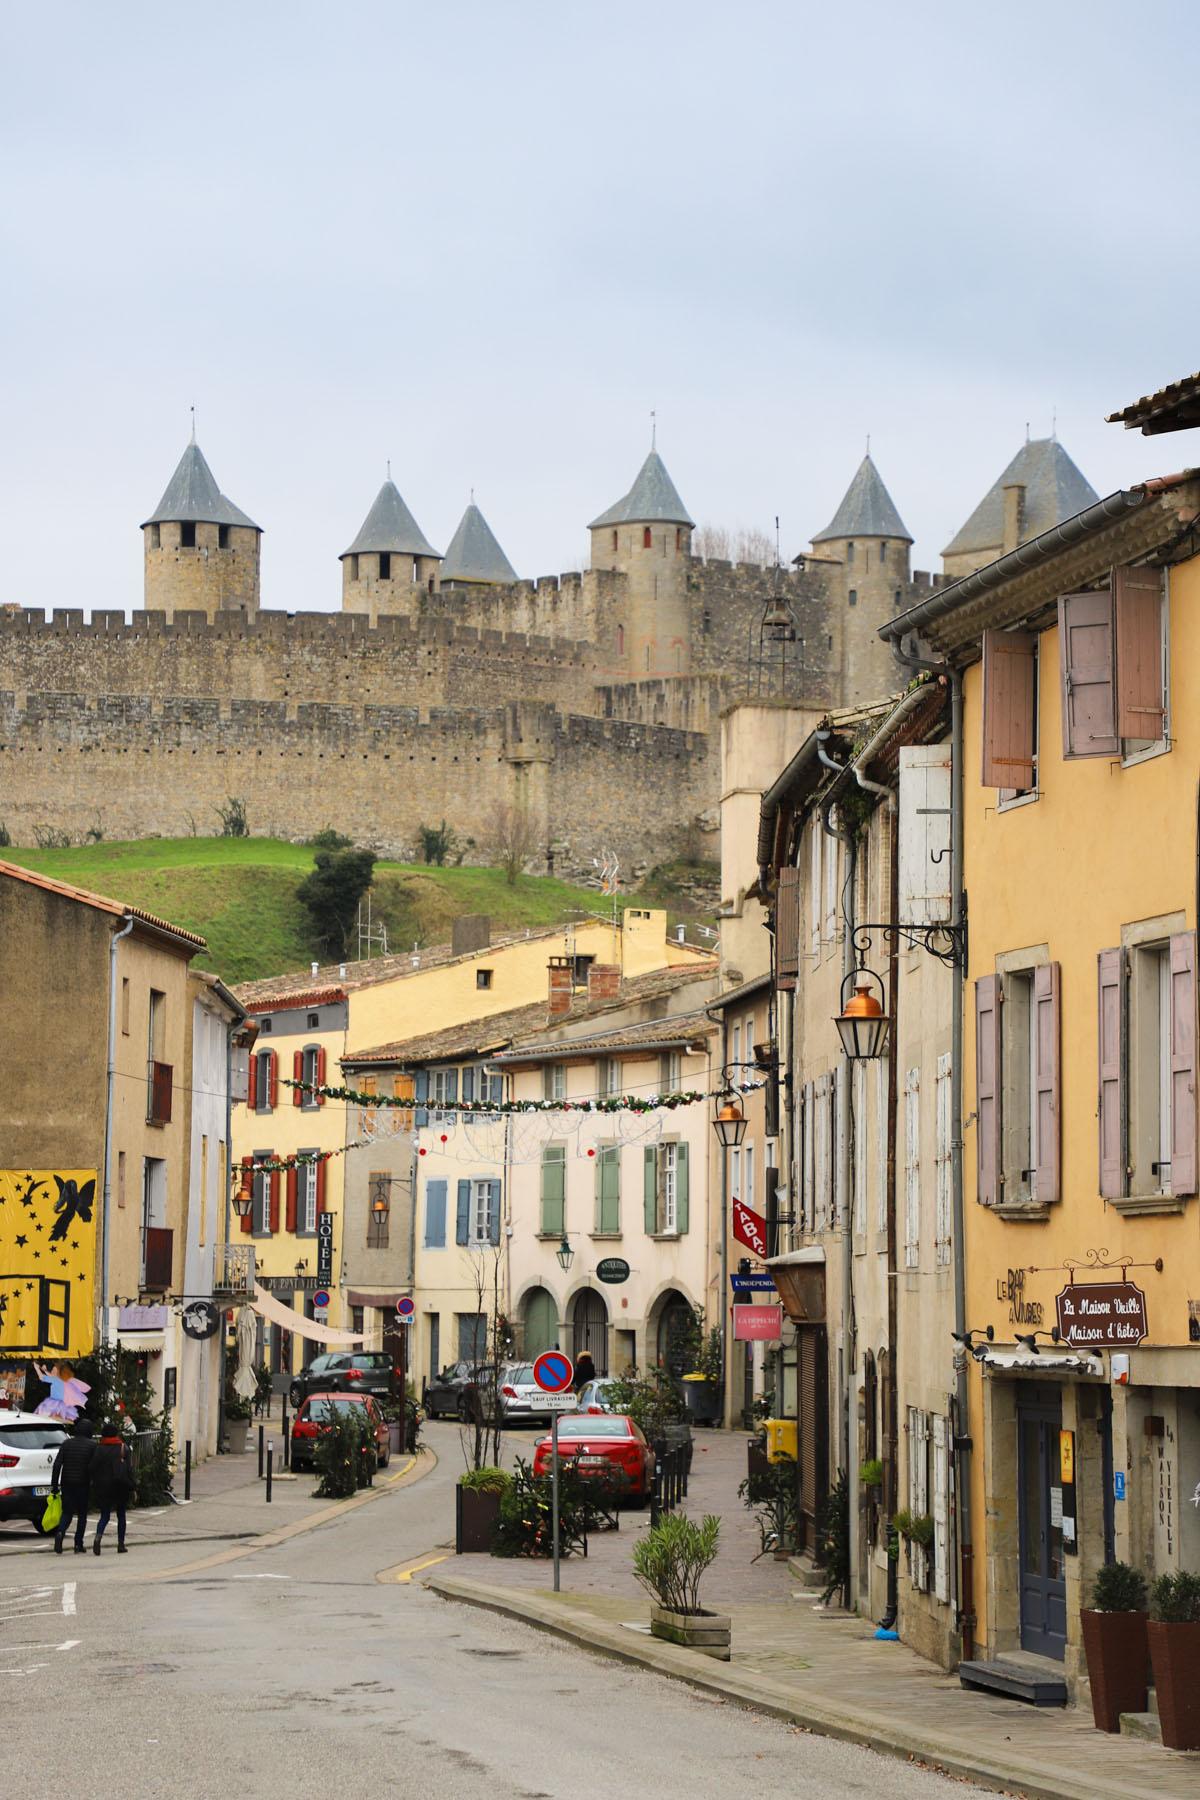 visiter-carcassonne-aude-occitanie-france